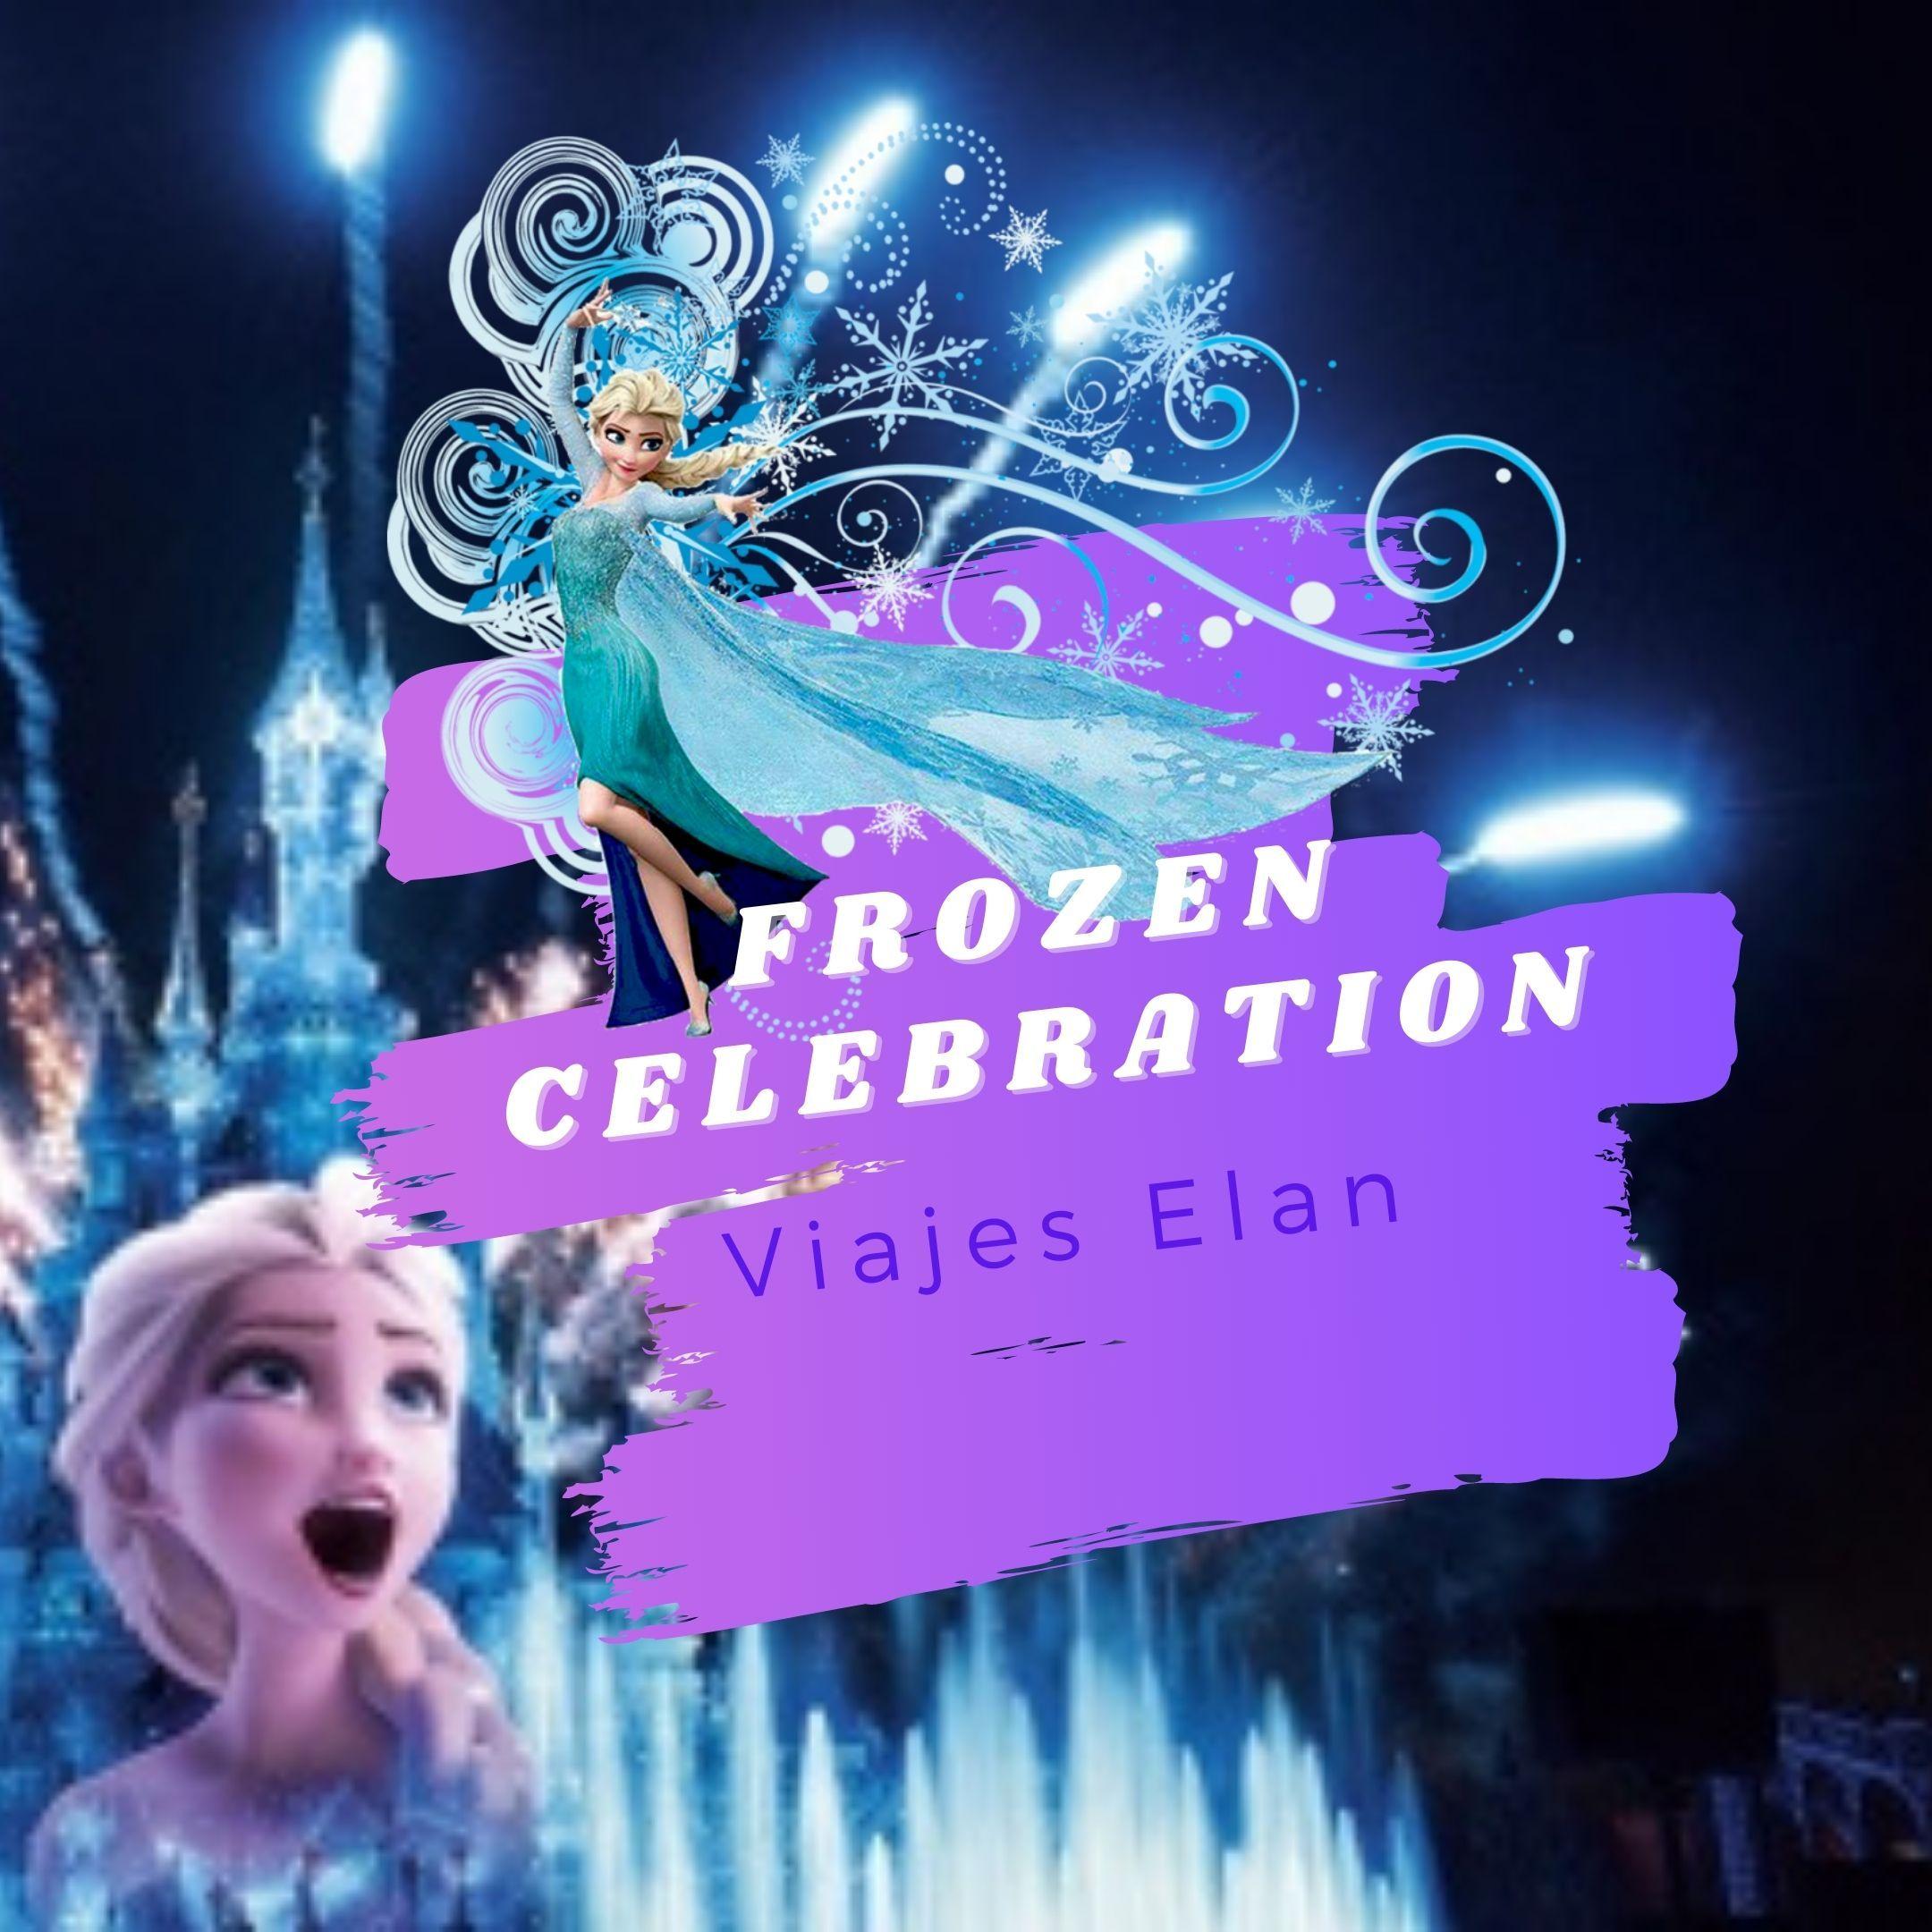 Frozen_celebration